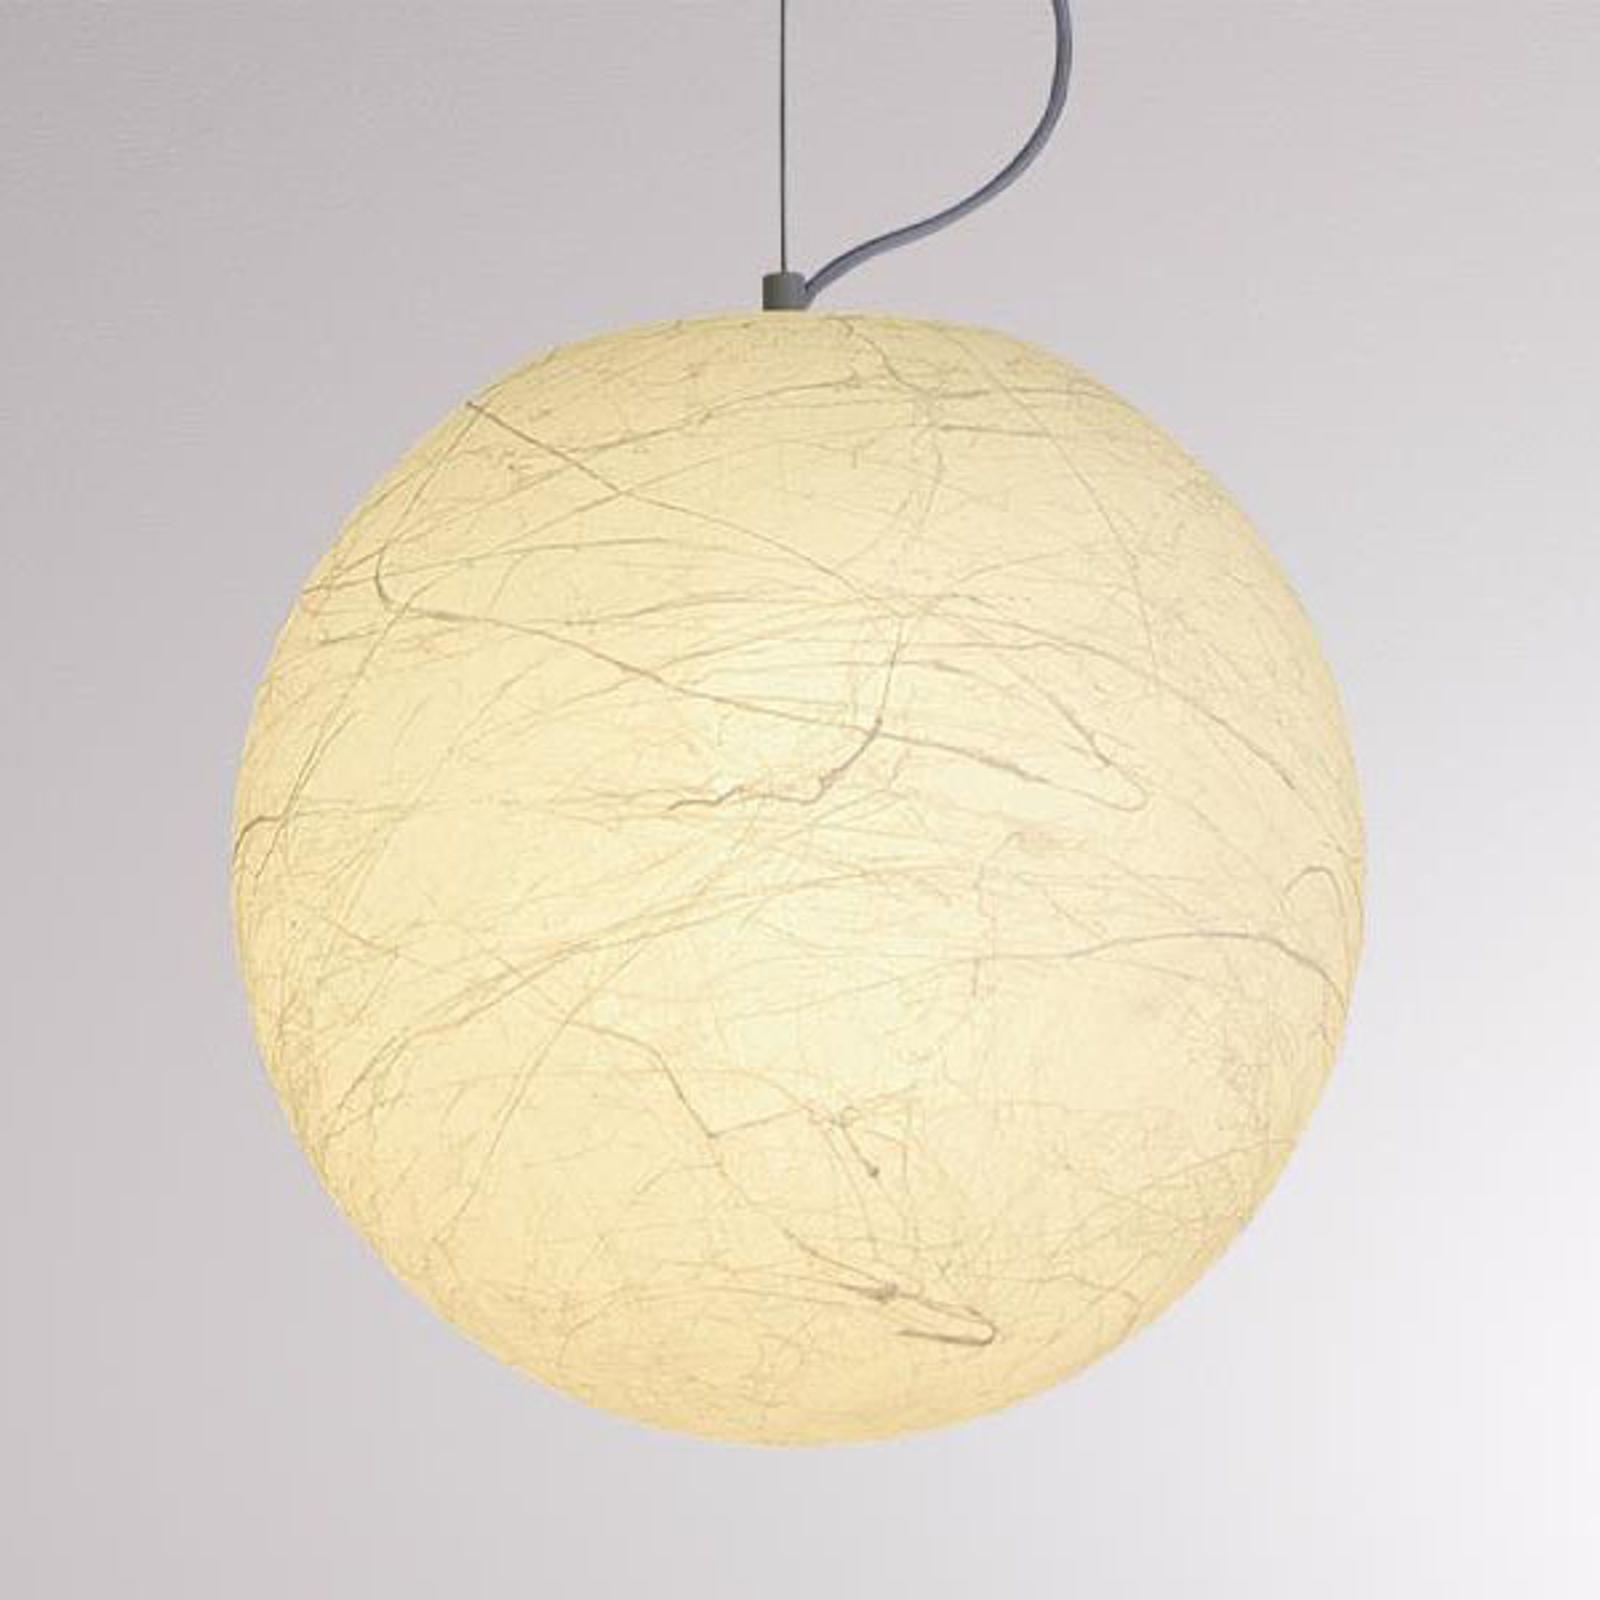 LOUM Diovis lampa wisząca Ø 60 cm